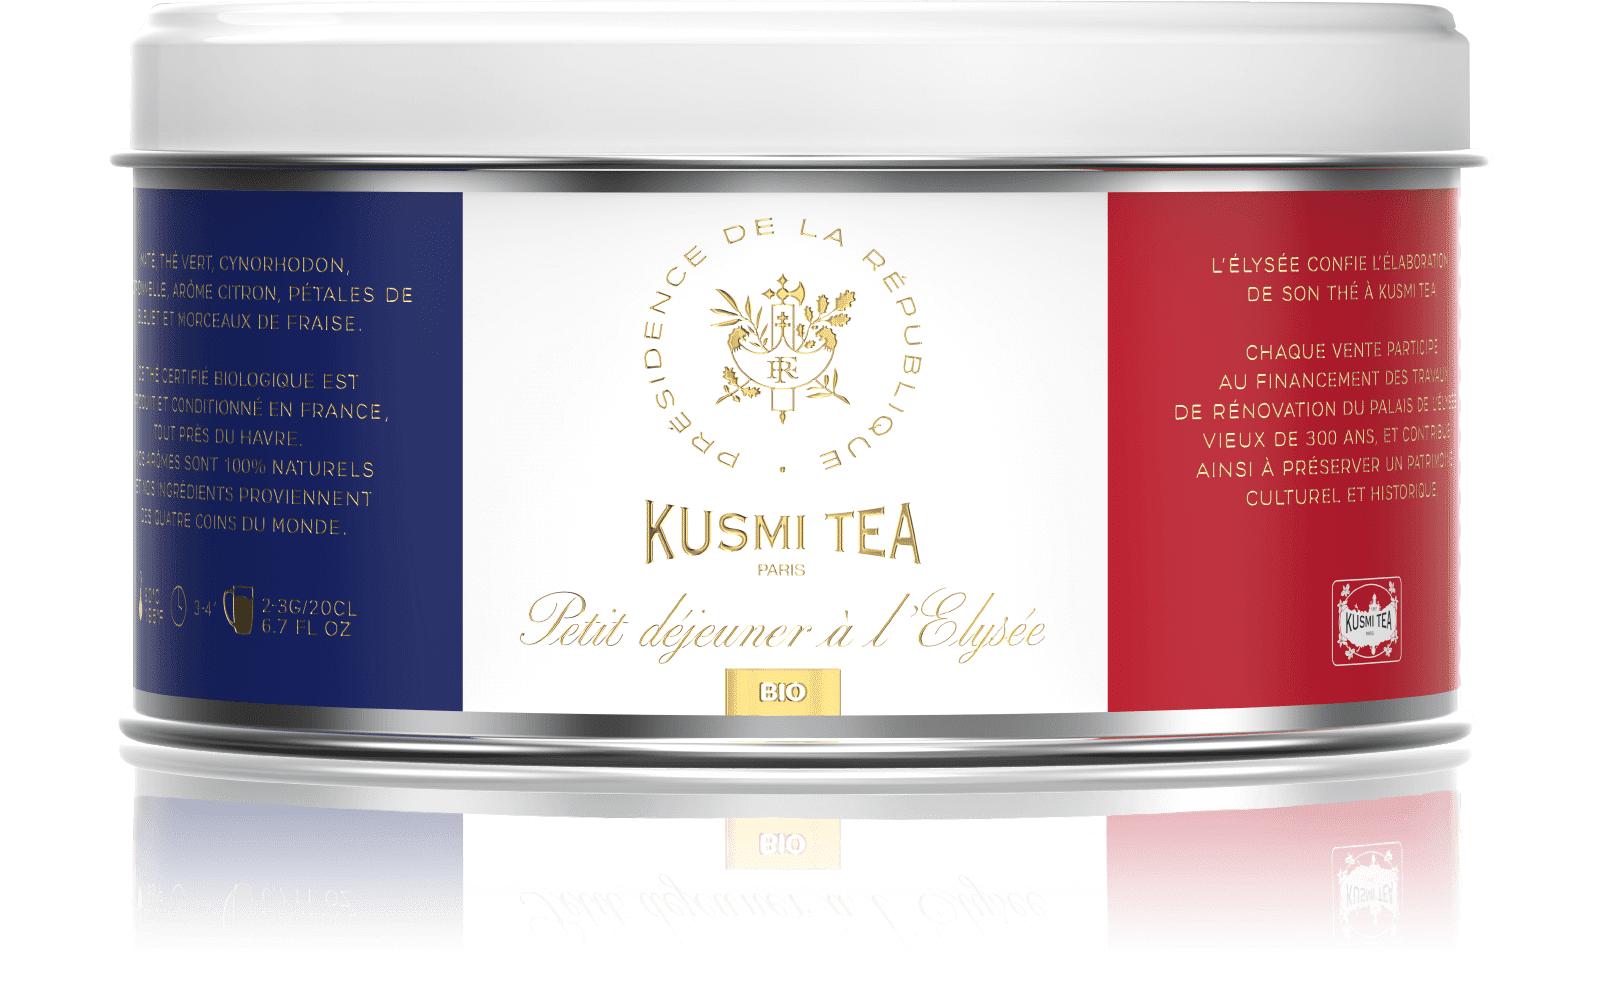 KUSMI TEA Petit déjeuner à l'Elysée bio Thé vert  Kusmi Tea